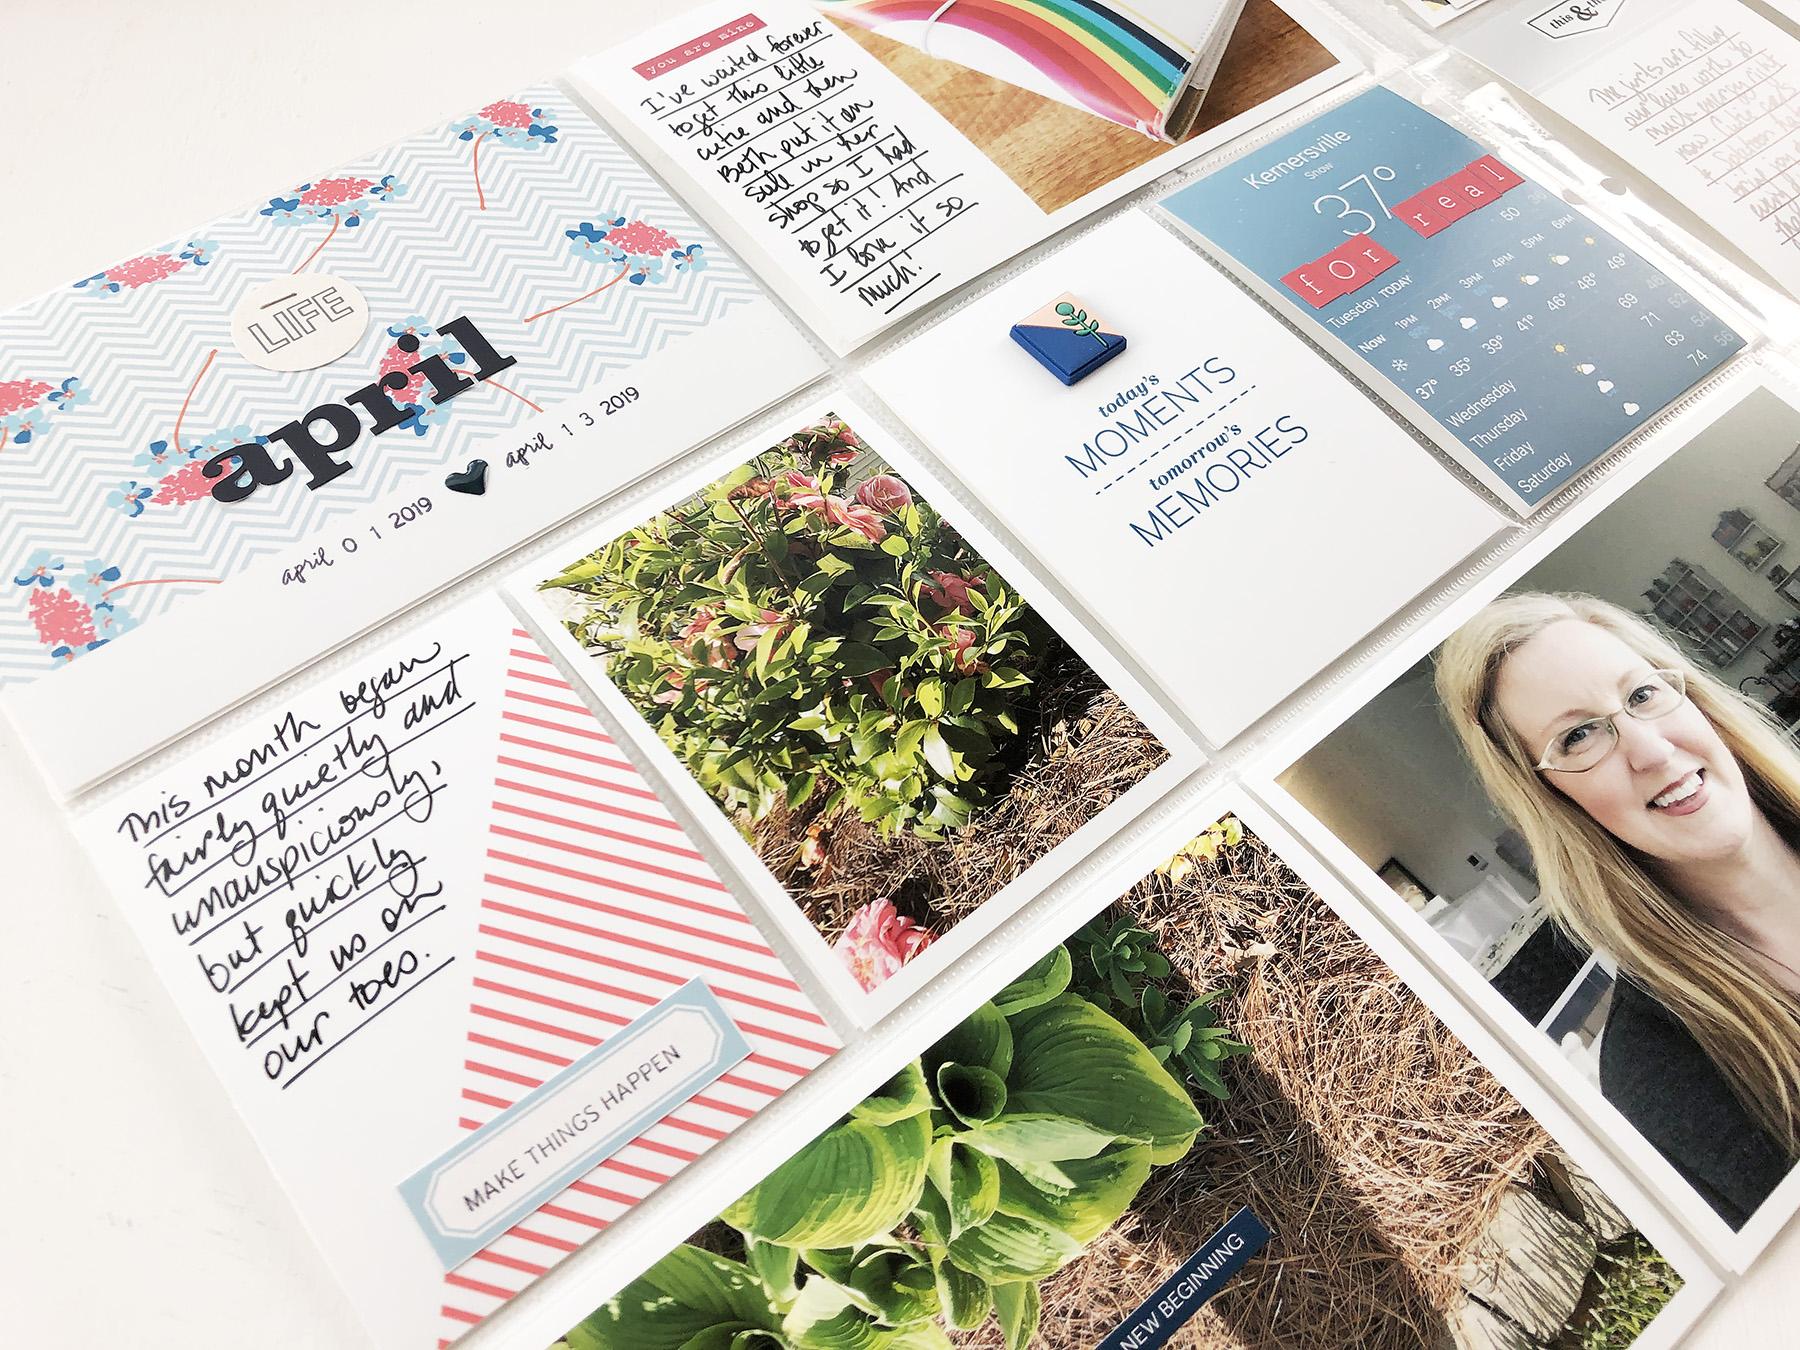 Larkindesign ***Sahlin Studio*** Design Team | 2019 Project Life Weeks 14 and 15